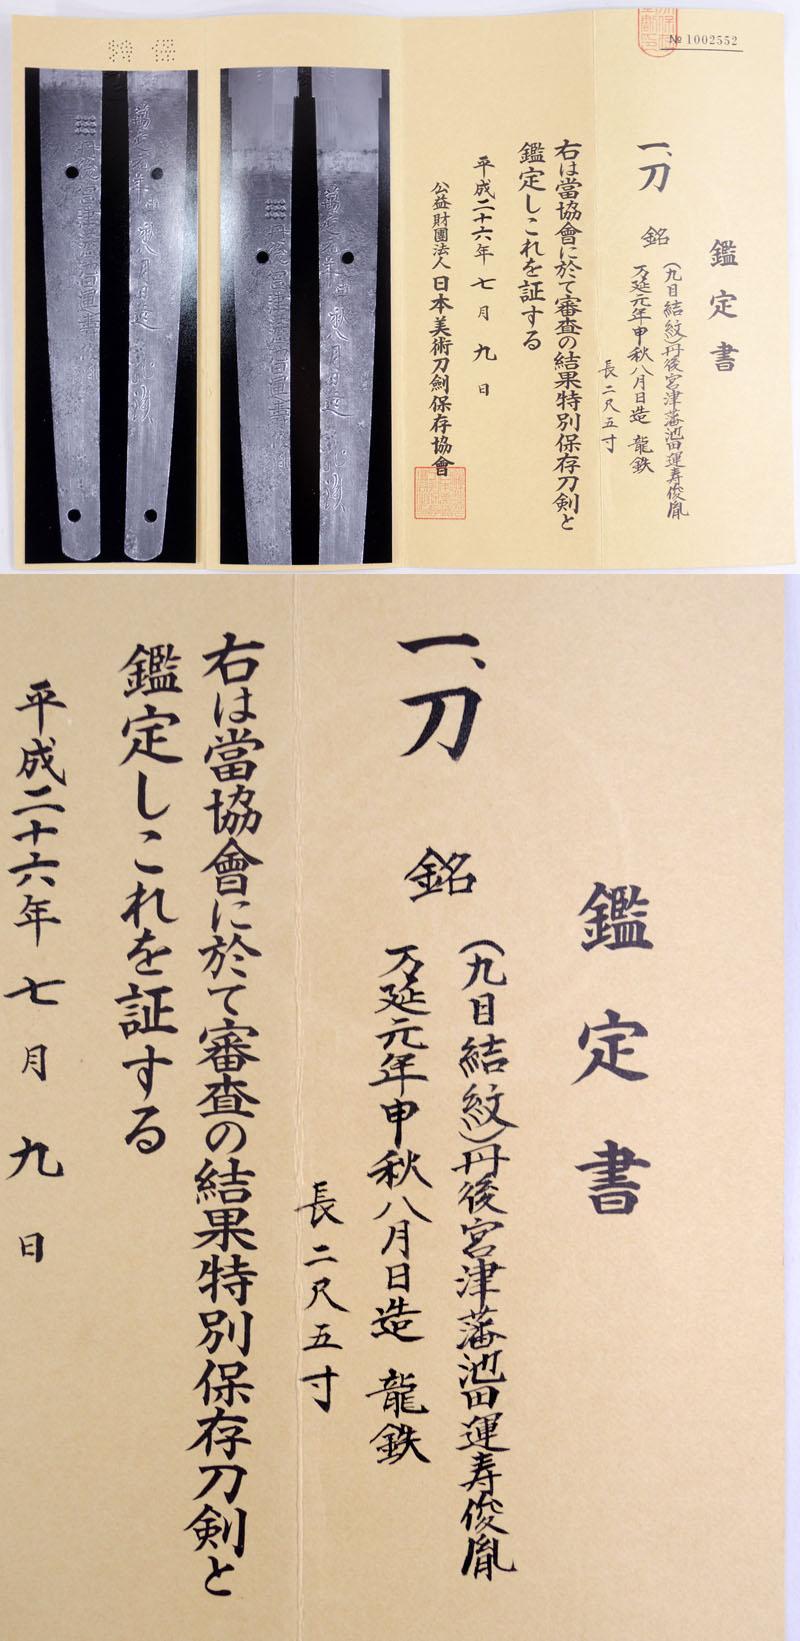 丹後宮津藩池田運寿俊胤 Picture of Certificate